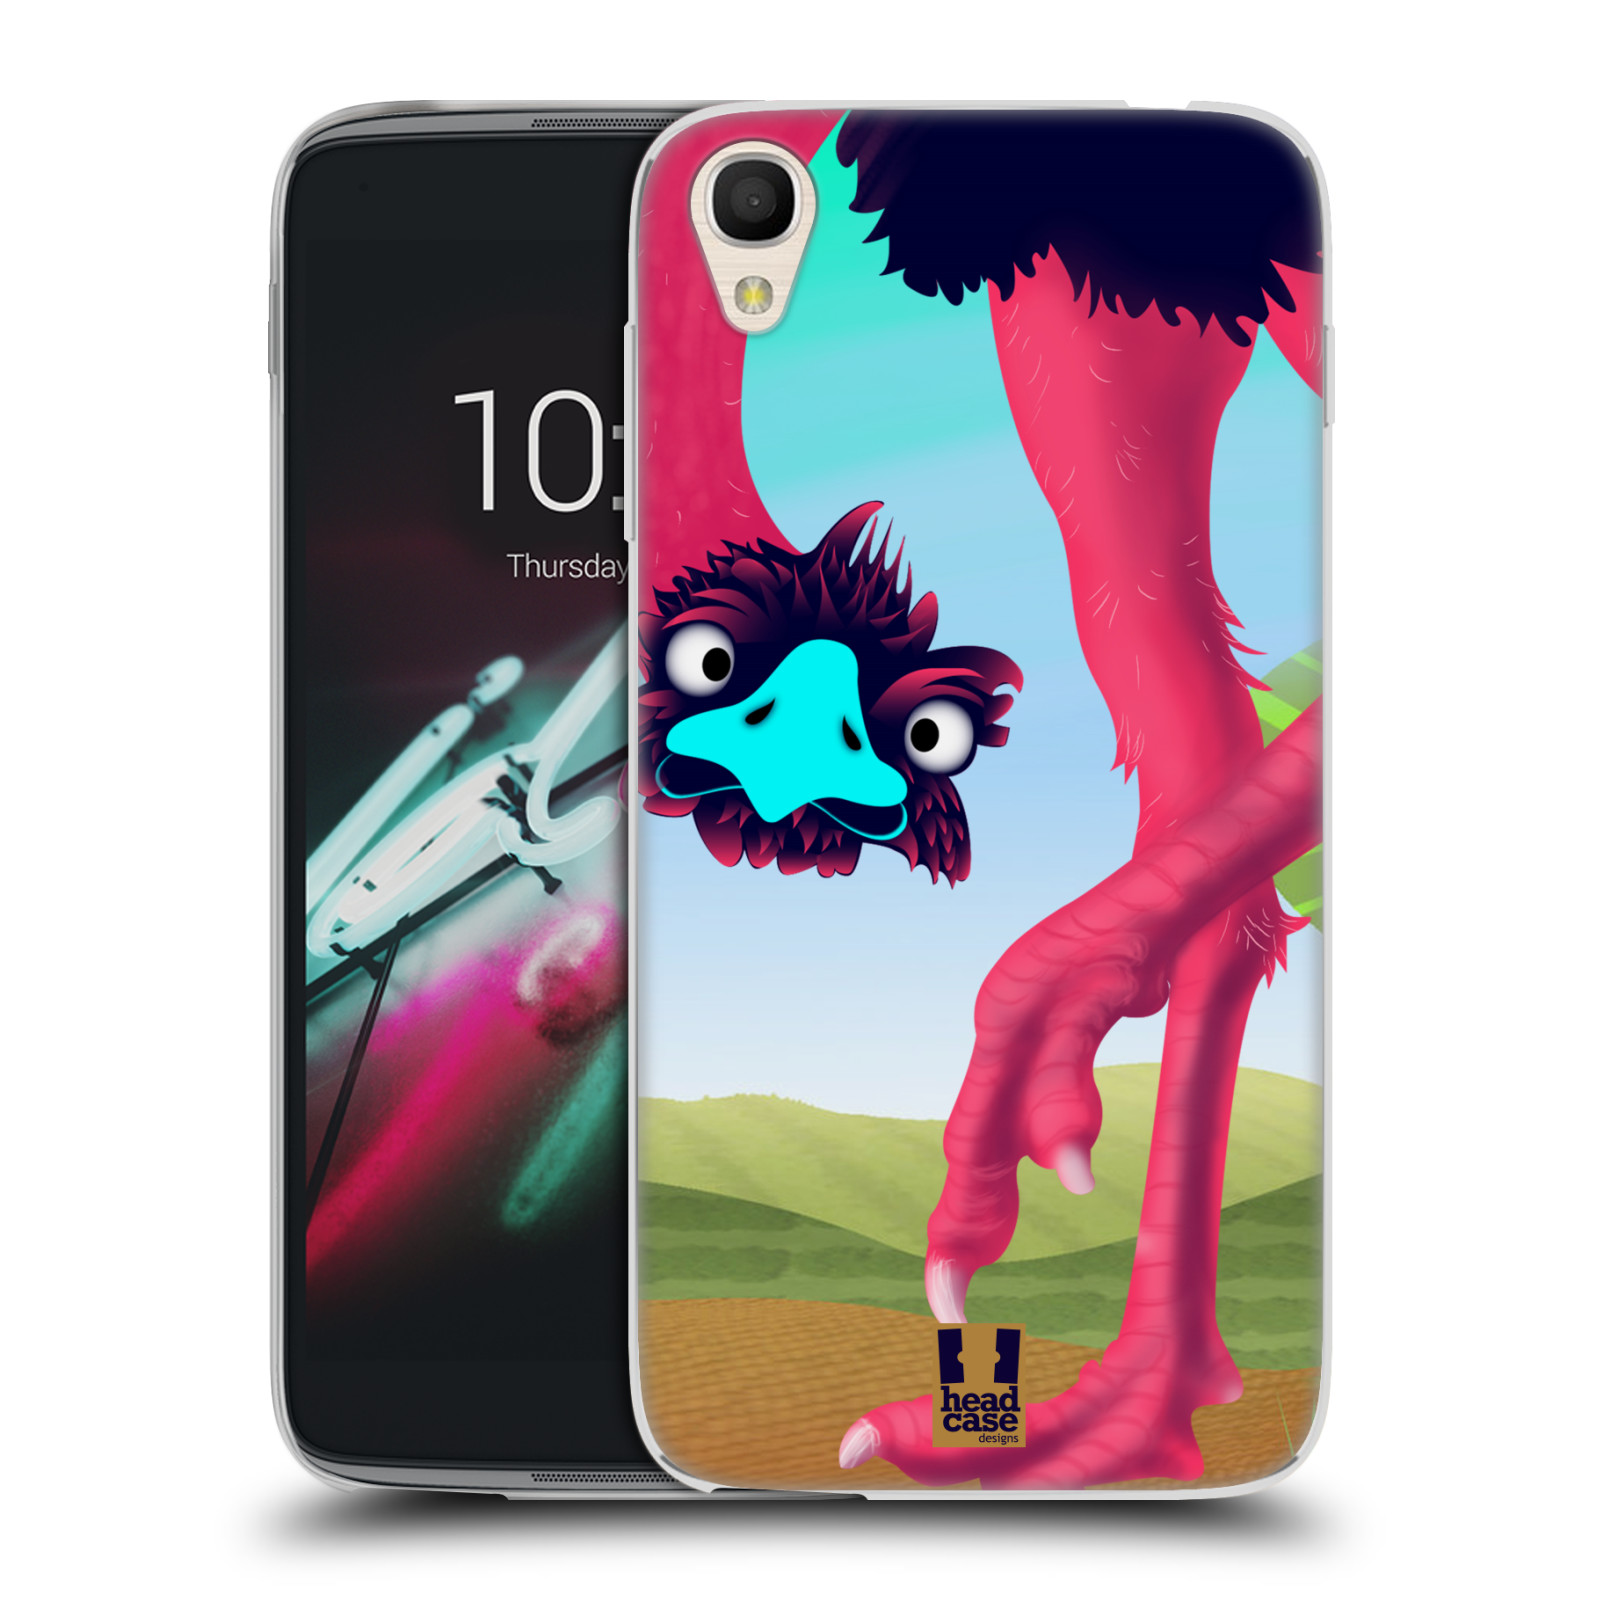 HEAD CASE silikonový obal na mobil Alcatel Idol 3 OT-6039Y (4.7) vzor dlouhé nohy kreslená zvířátka pštros